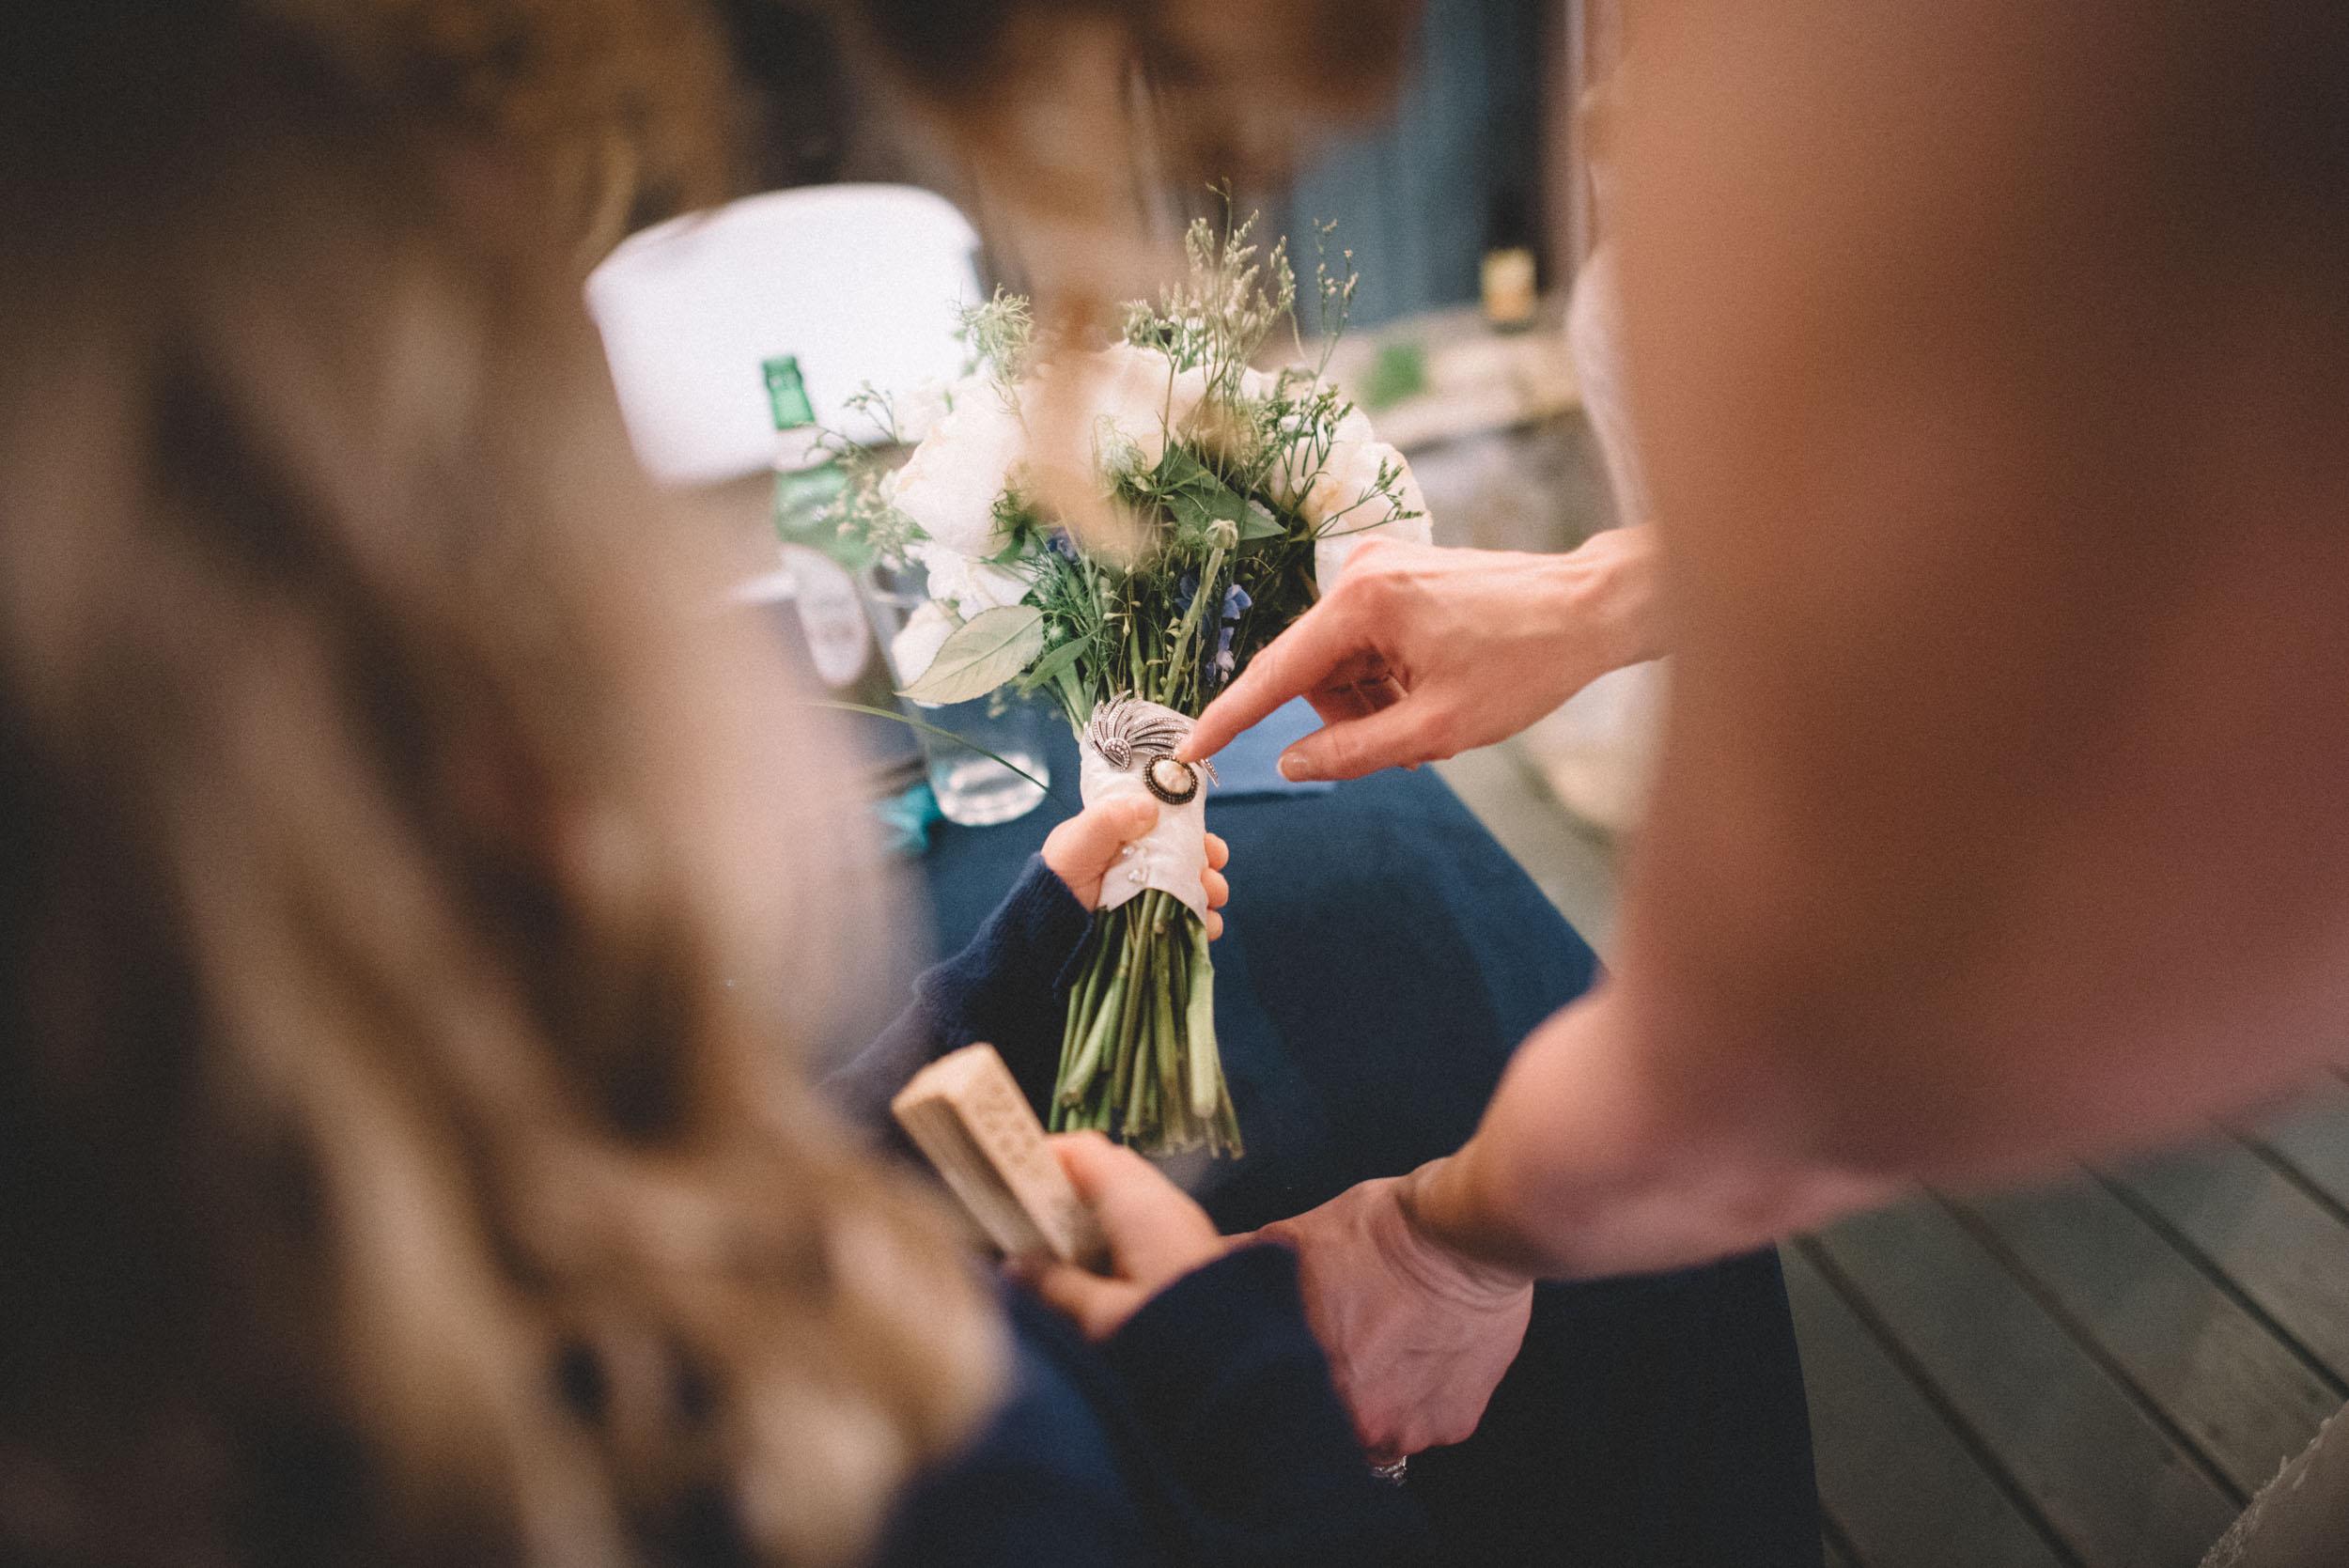 Gaie-Lea-Staunton-weddding-photographer-81.jpg